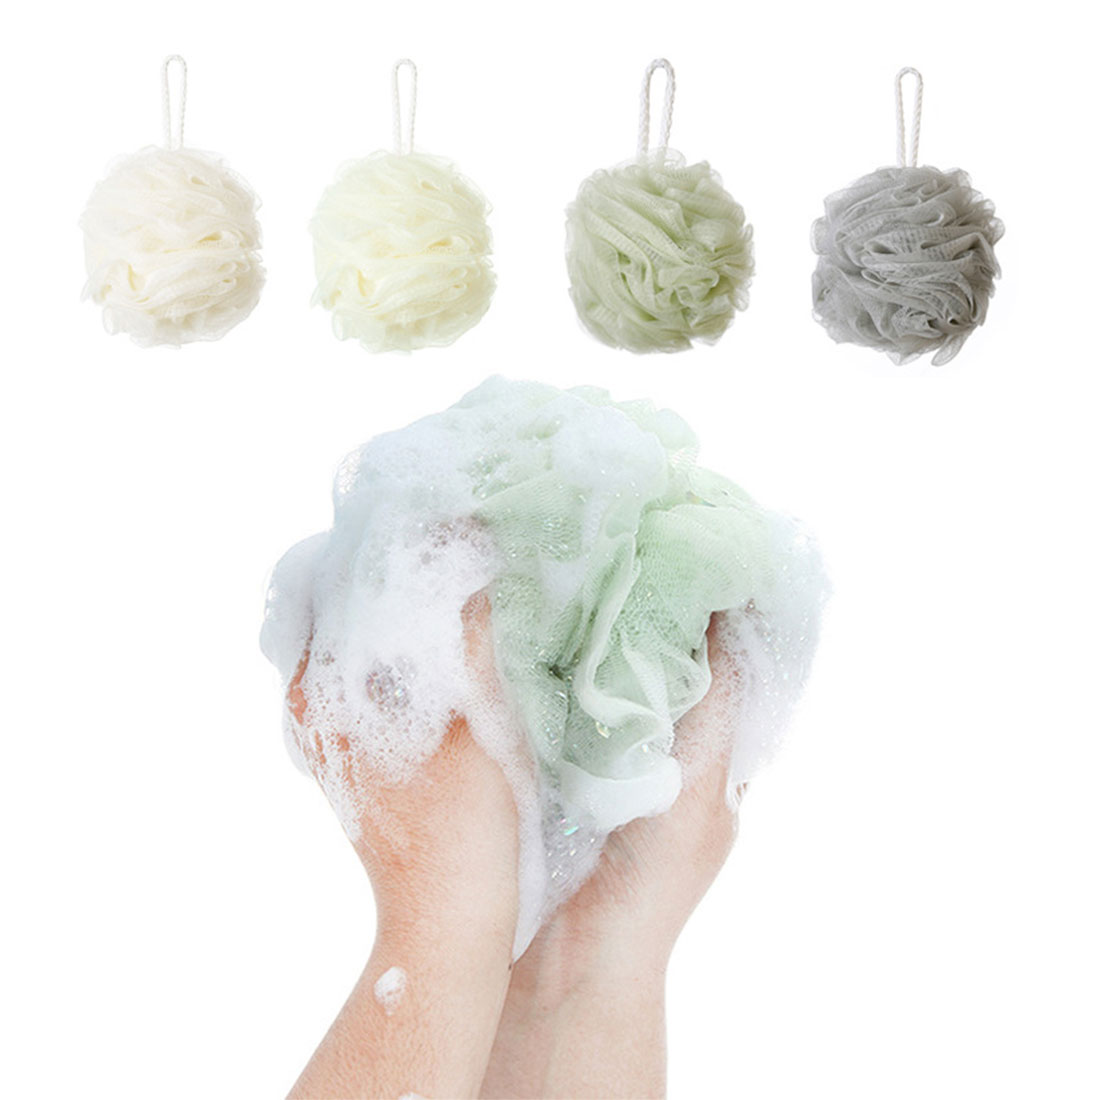 1PCS Random Color bath ball bathsite bath tubs Cool ball bath towel scrubber Body cleaning Mesh Shower wash Sponge product